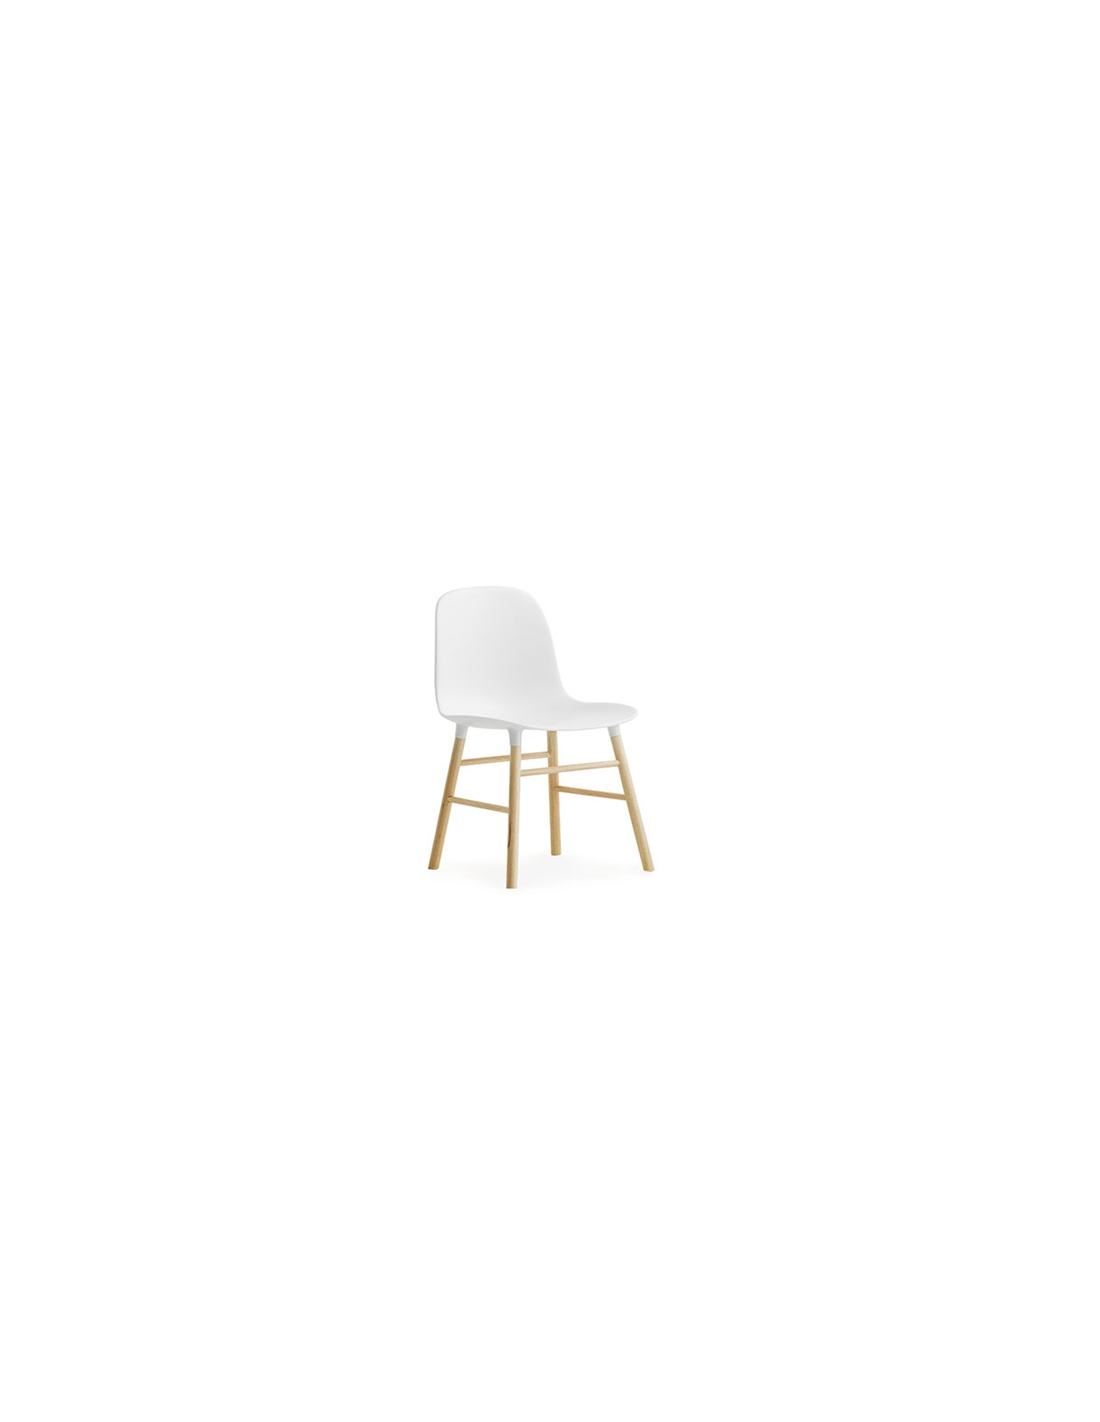 miniatur stuhl form von normann copenhagen. Black Bedroom Furniture Sets. Home Design Ideas